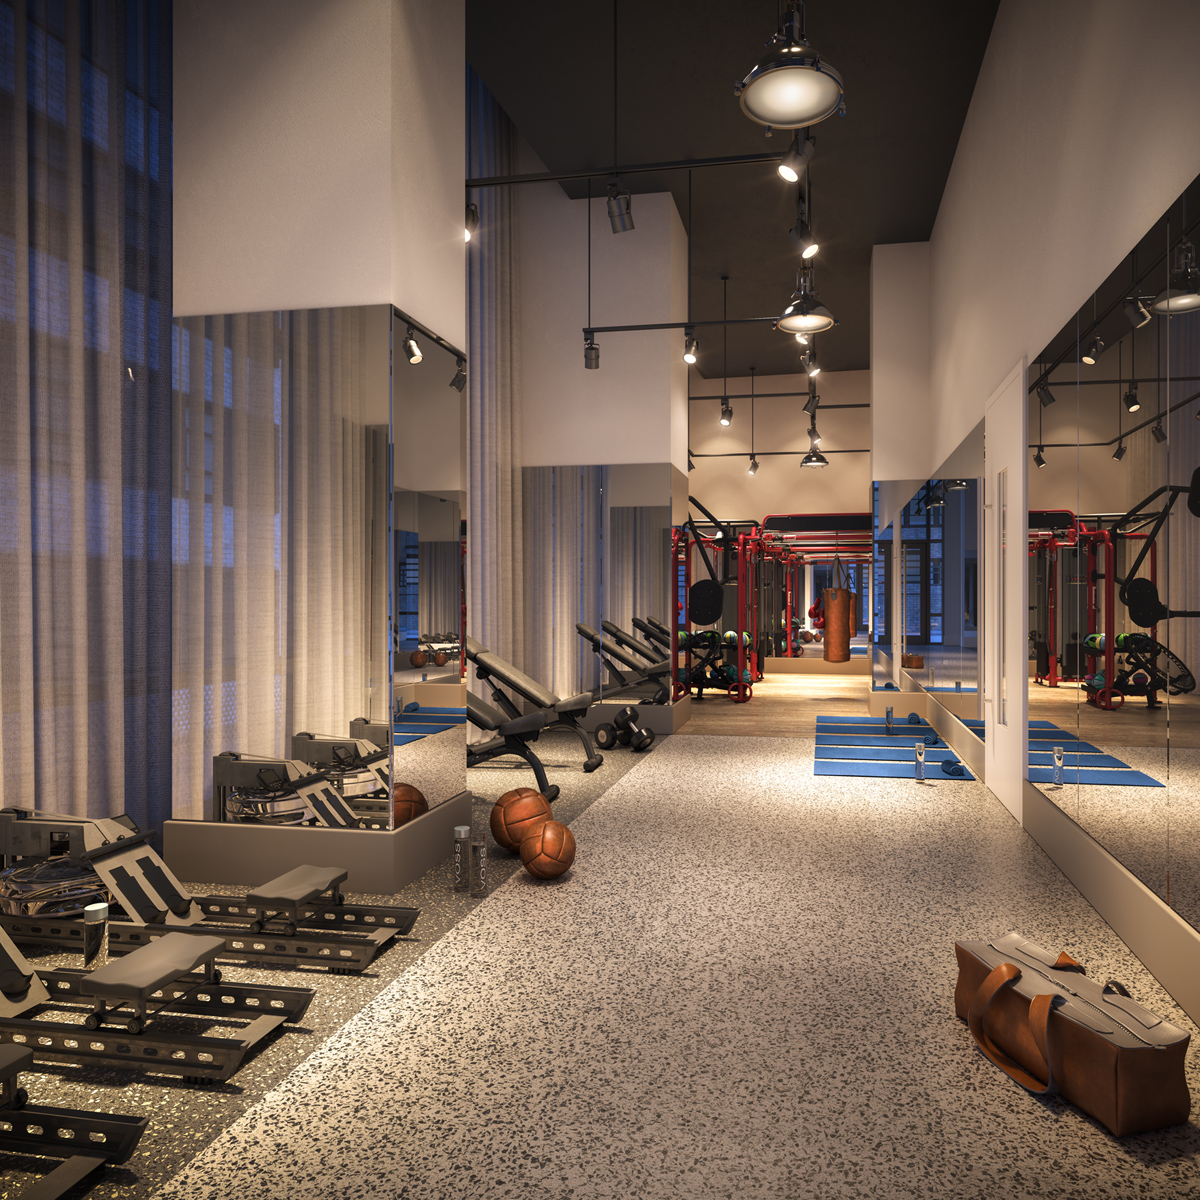 19 Dutch - fitness center - luxury apt amenity